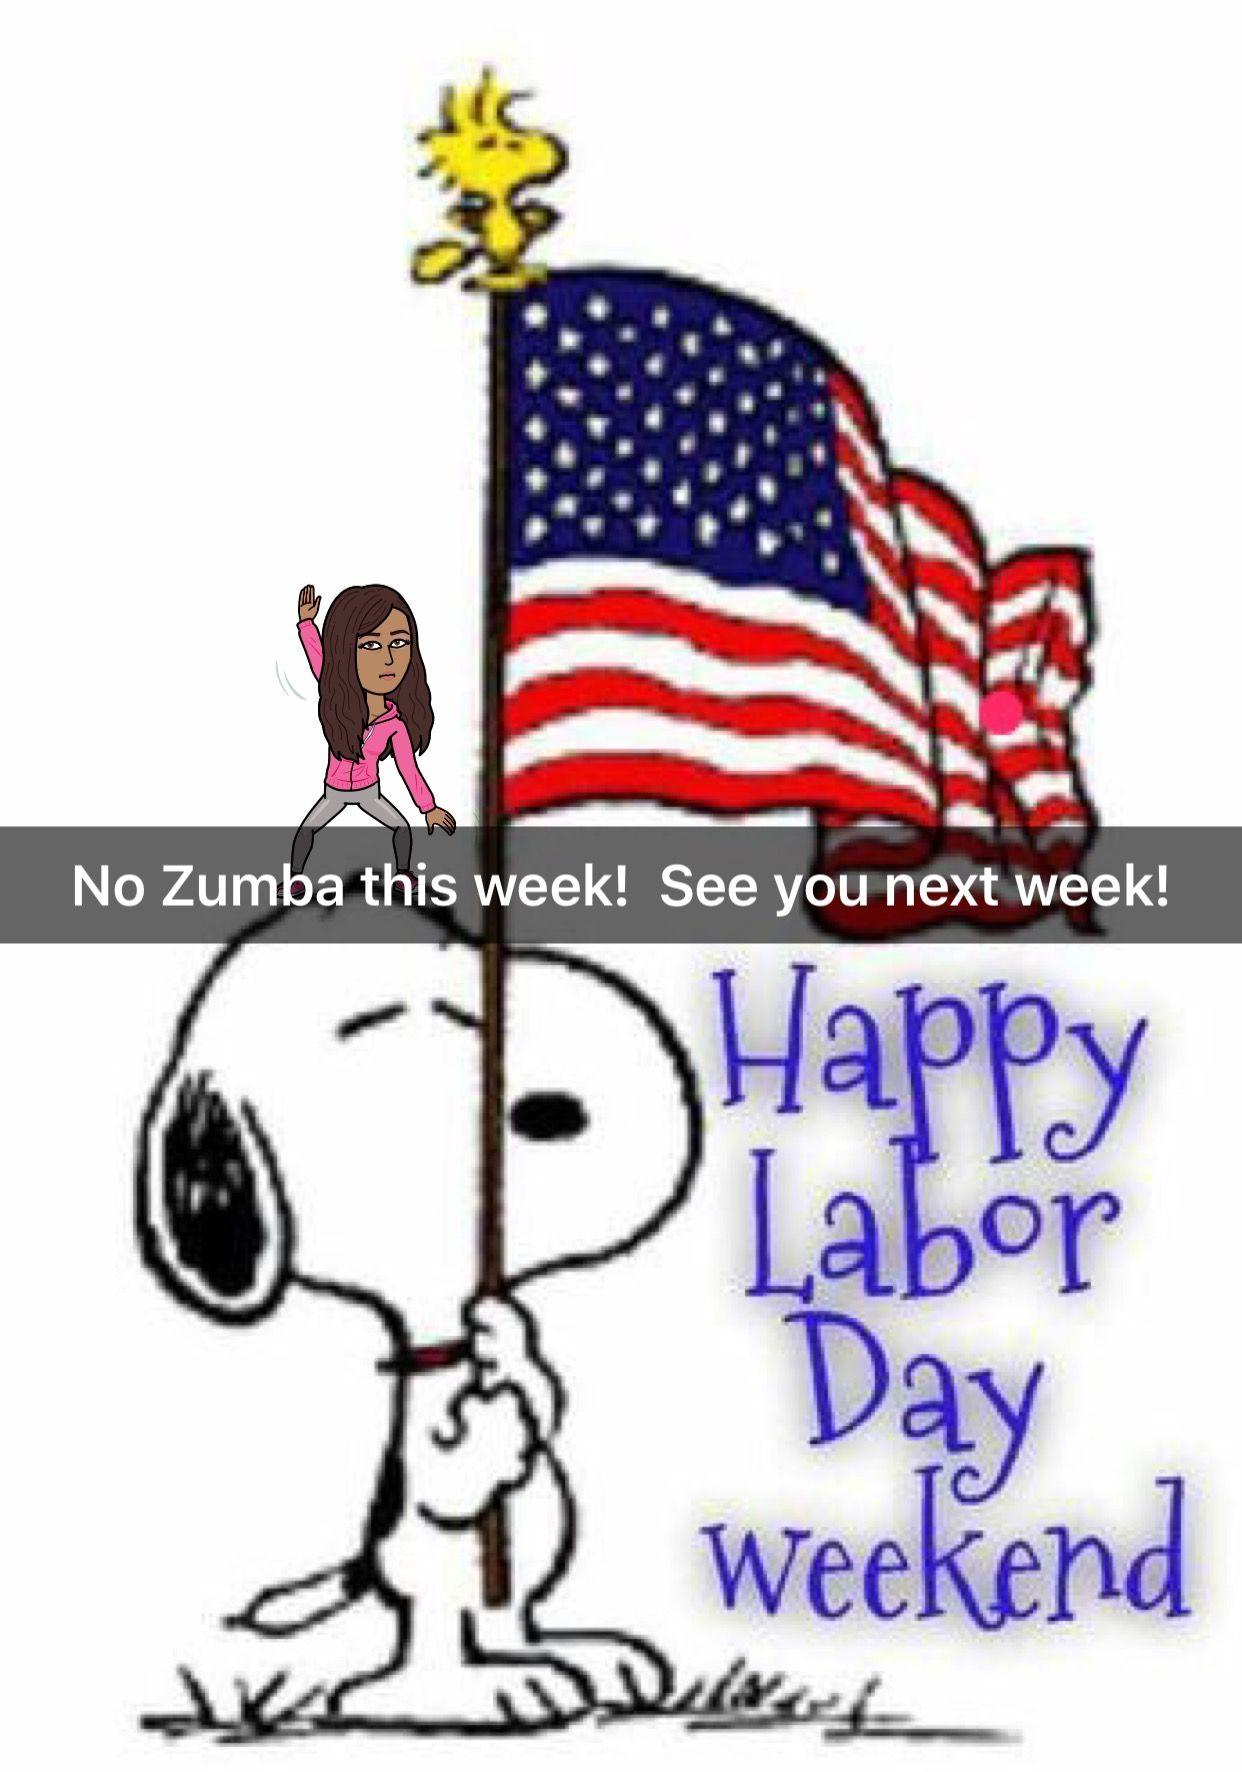 Pin by mcbrnasbsmba on Zumbalicious Happy labor day